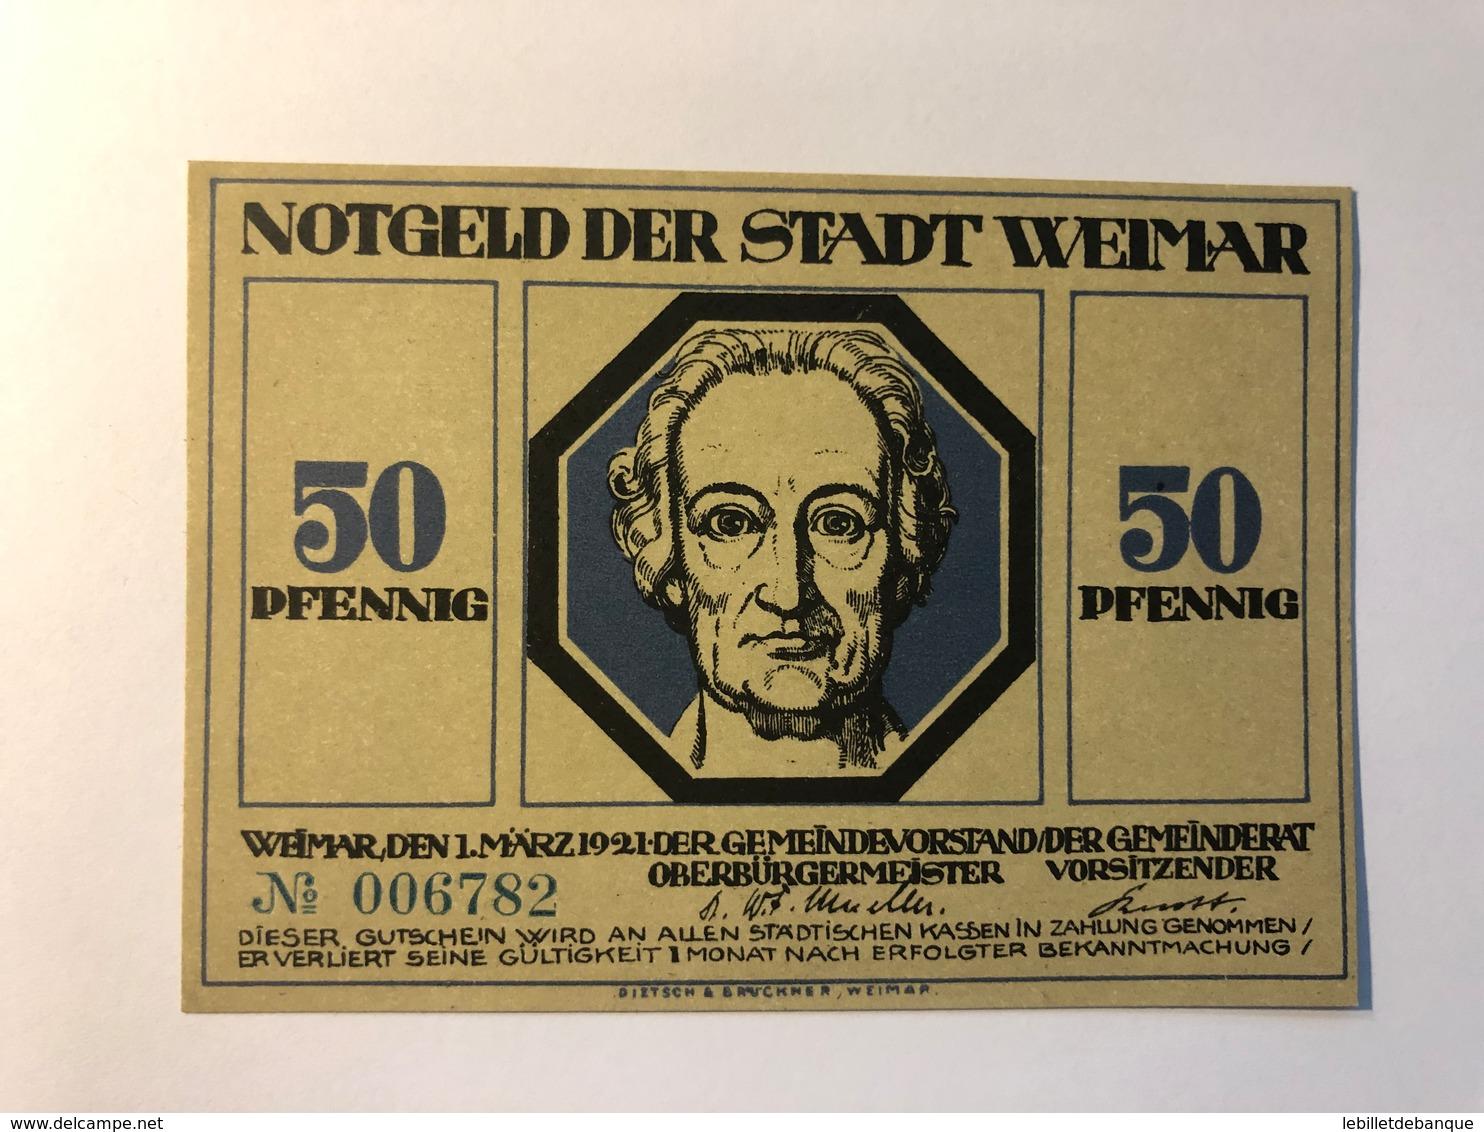 Allemagne Notgeld Weimar 50 Pfennig - [ 3] 1918-1933 : République De Weimar